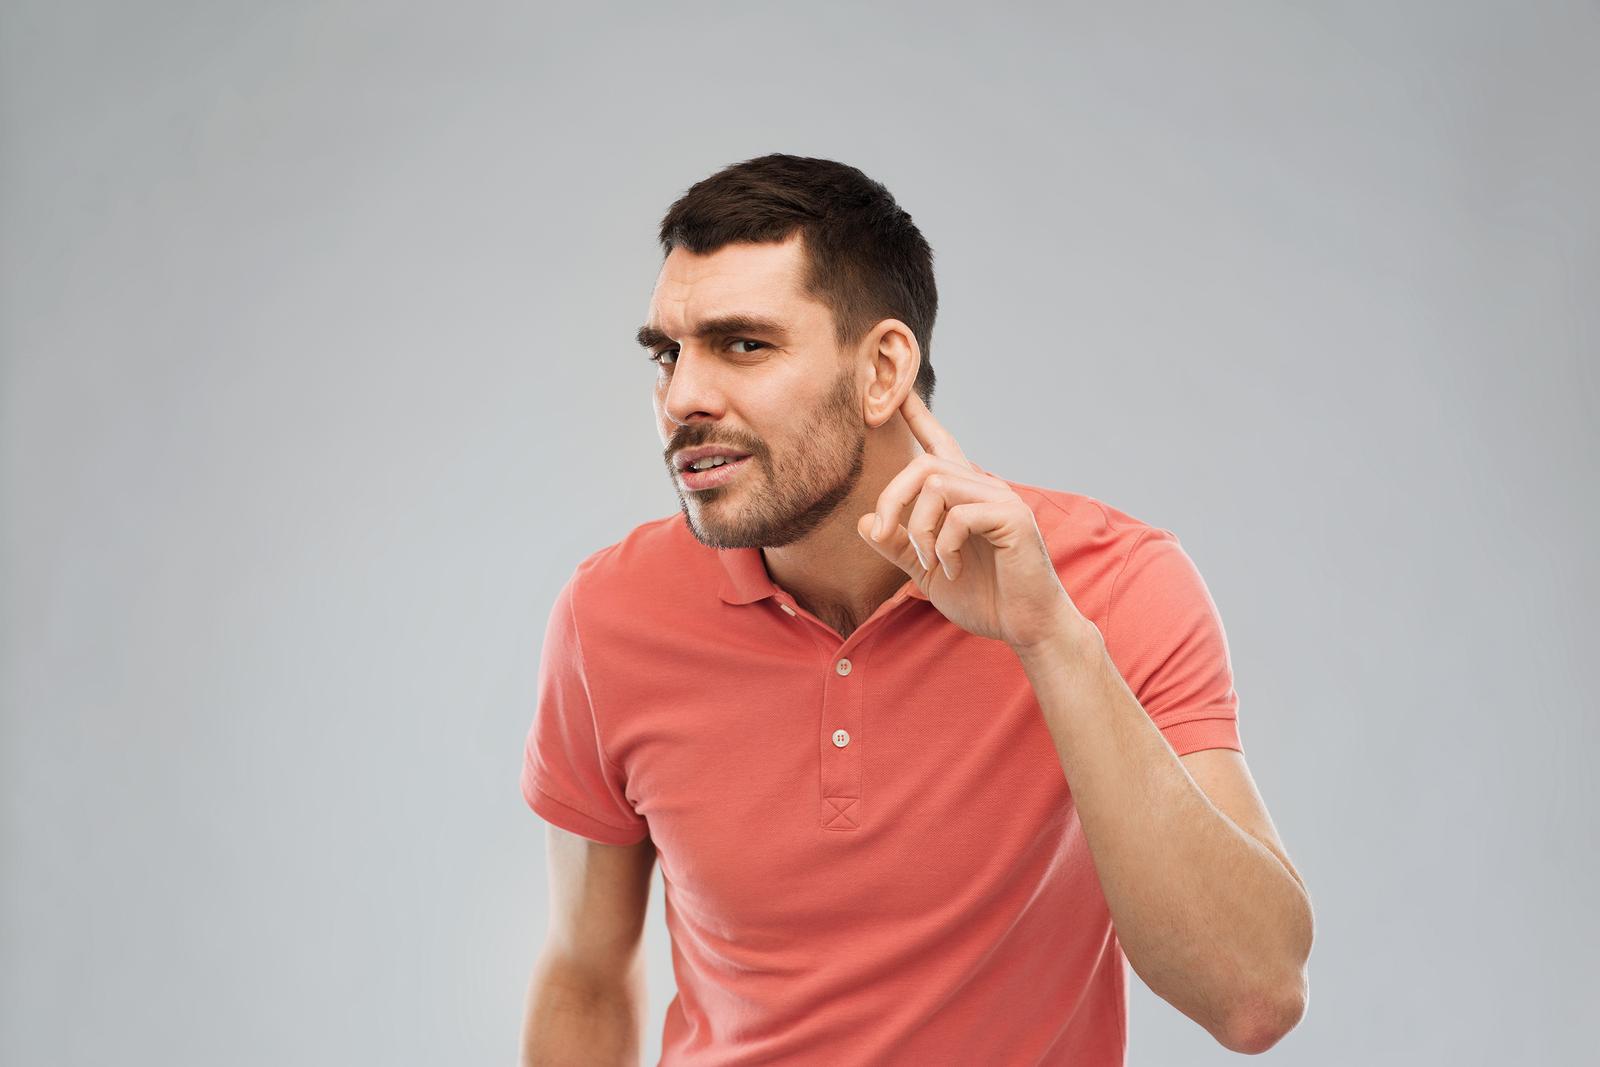 man listening to pronunciation